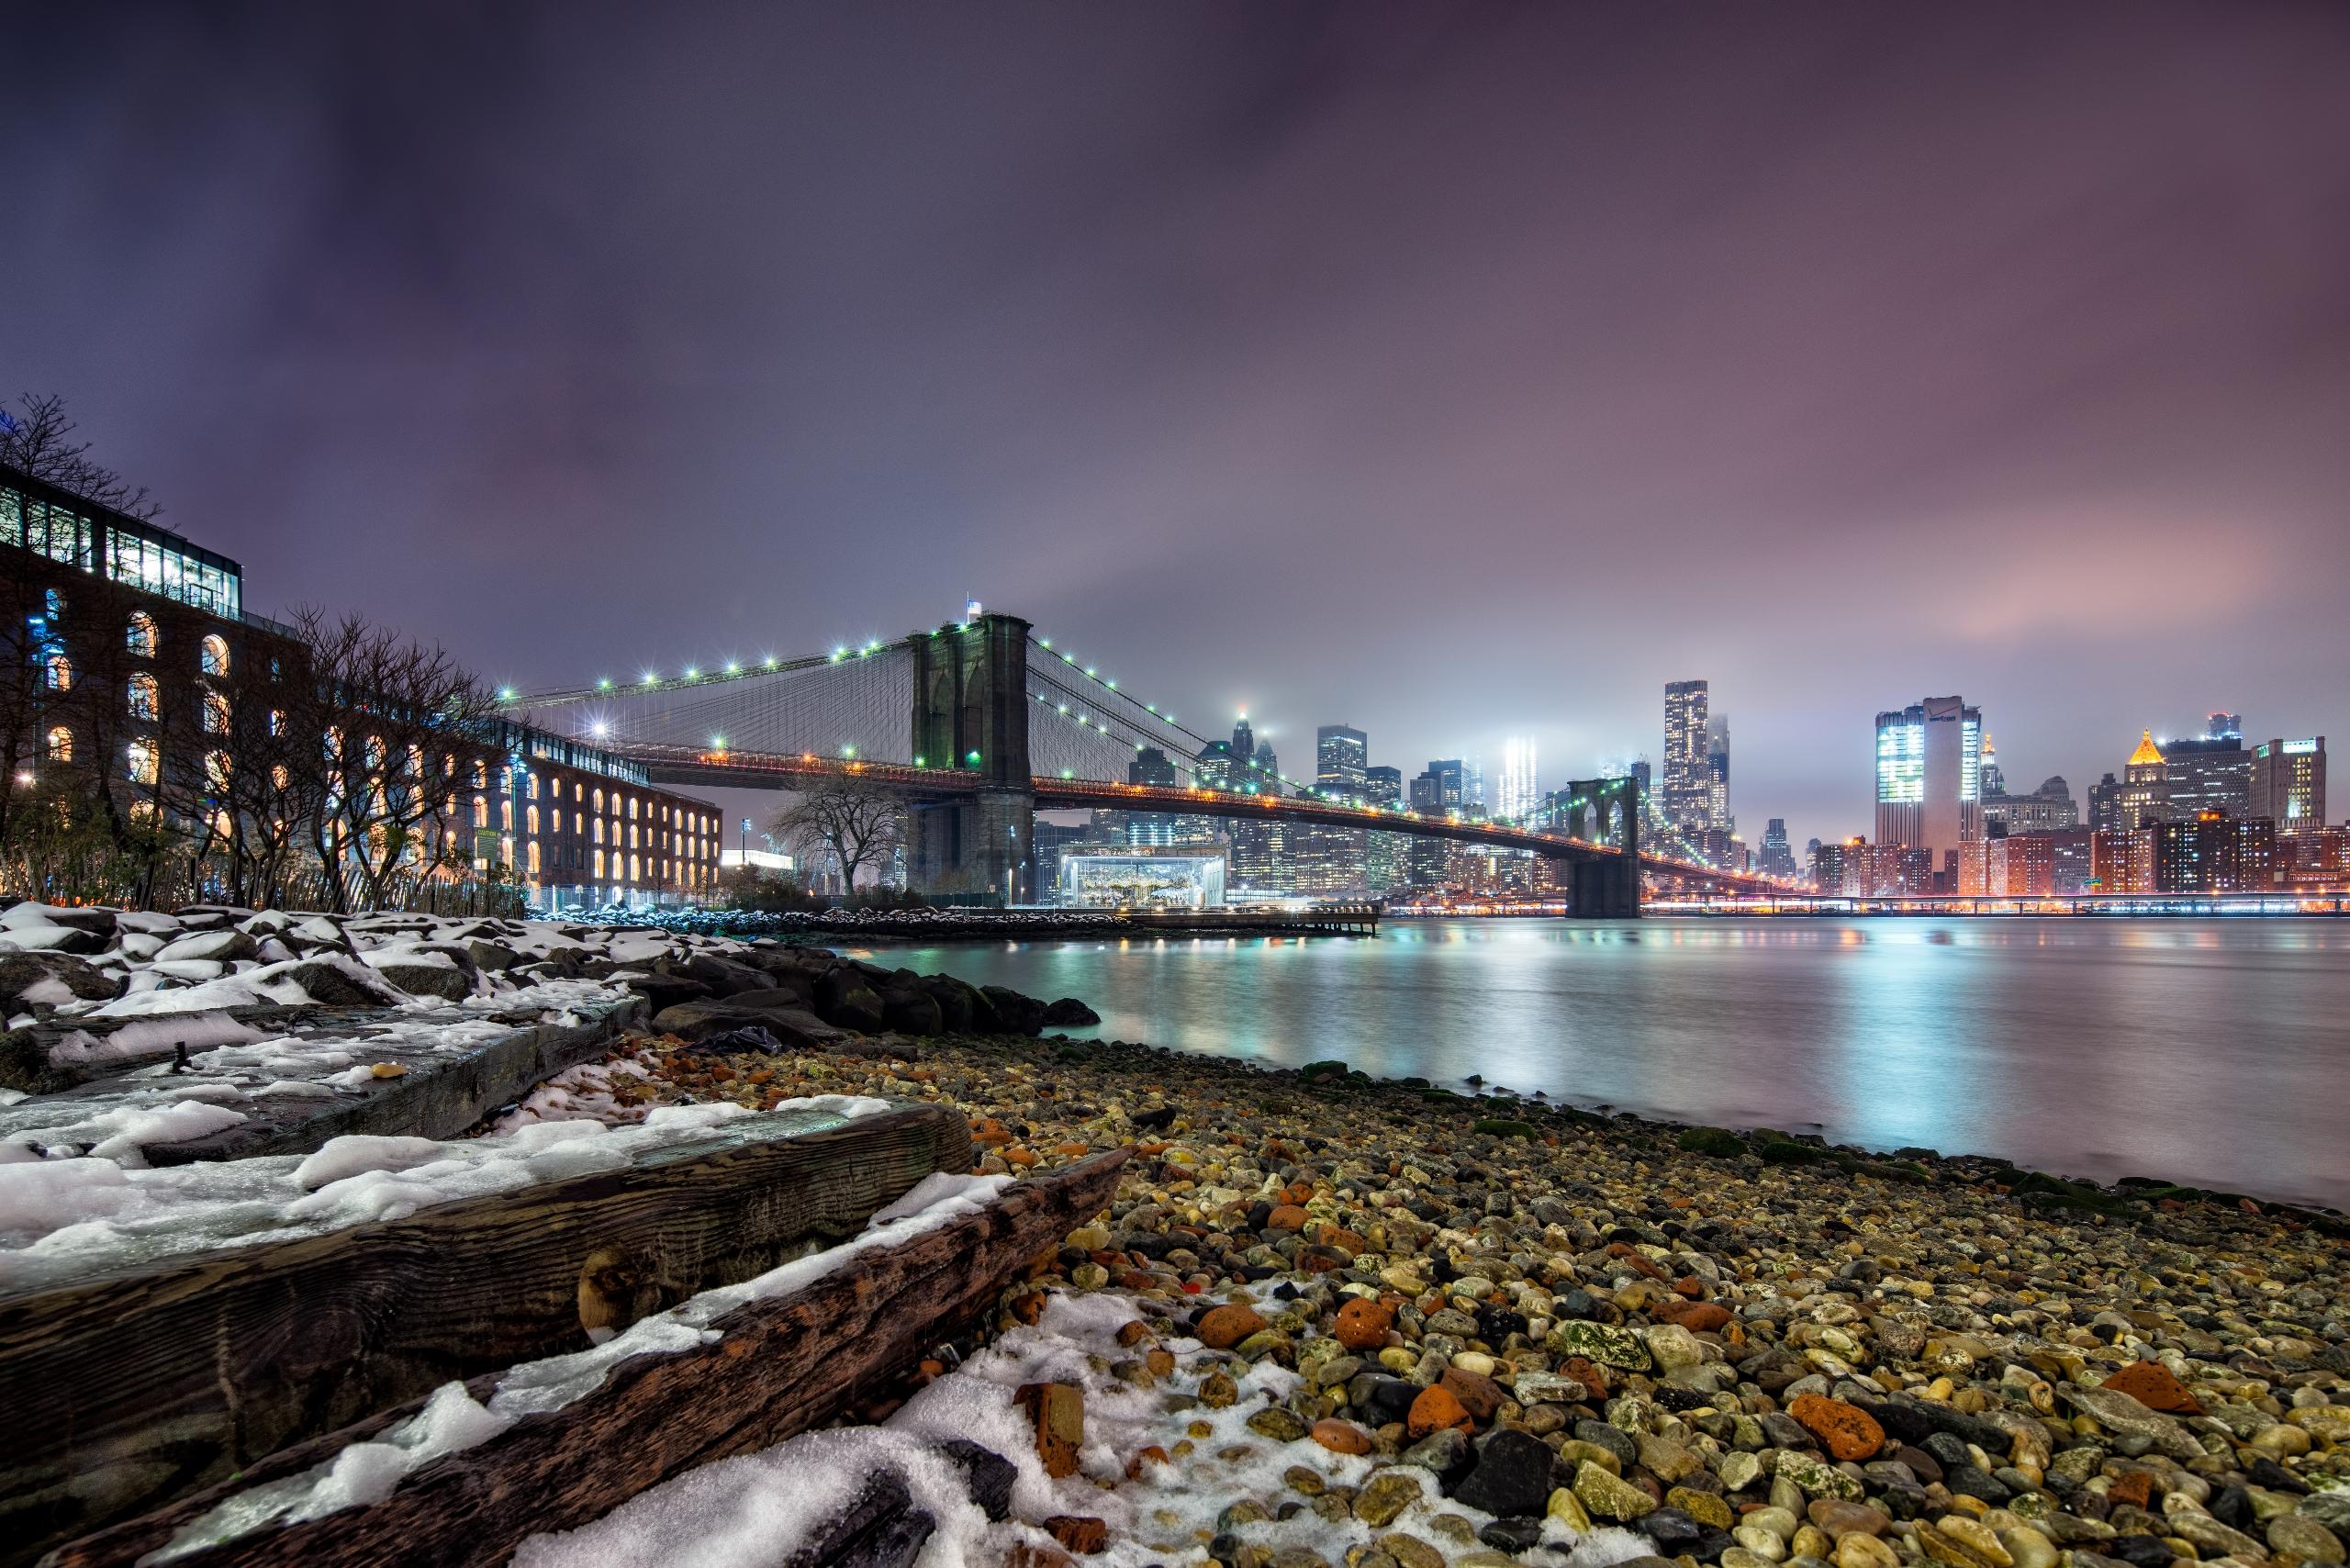 Snowy Brooklyn York City skylin - joelcorrente | ello